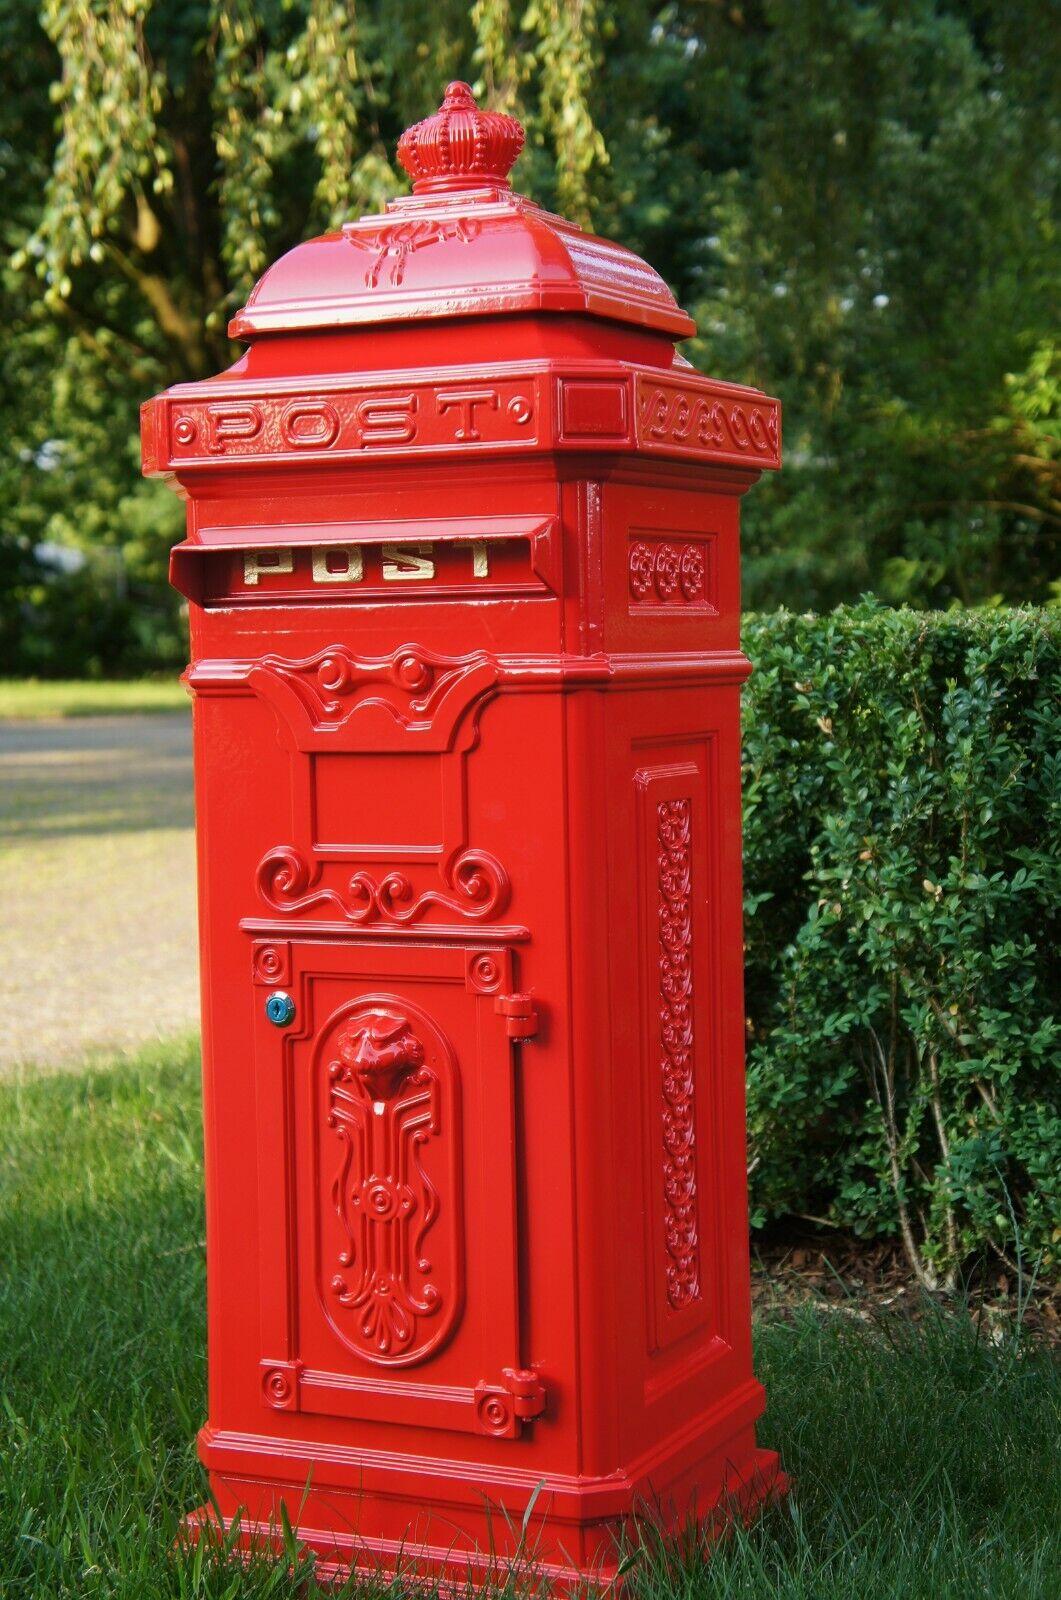 Standbriefkasten Briefkasten Postkasten Säulenbriefkasten Post Retro Aluminium